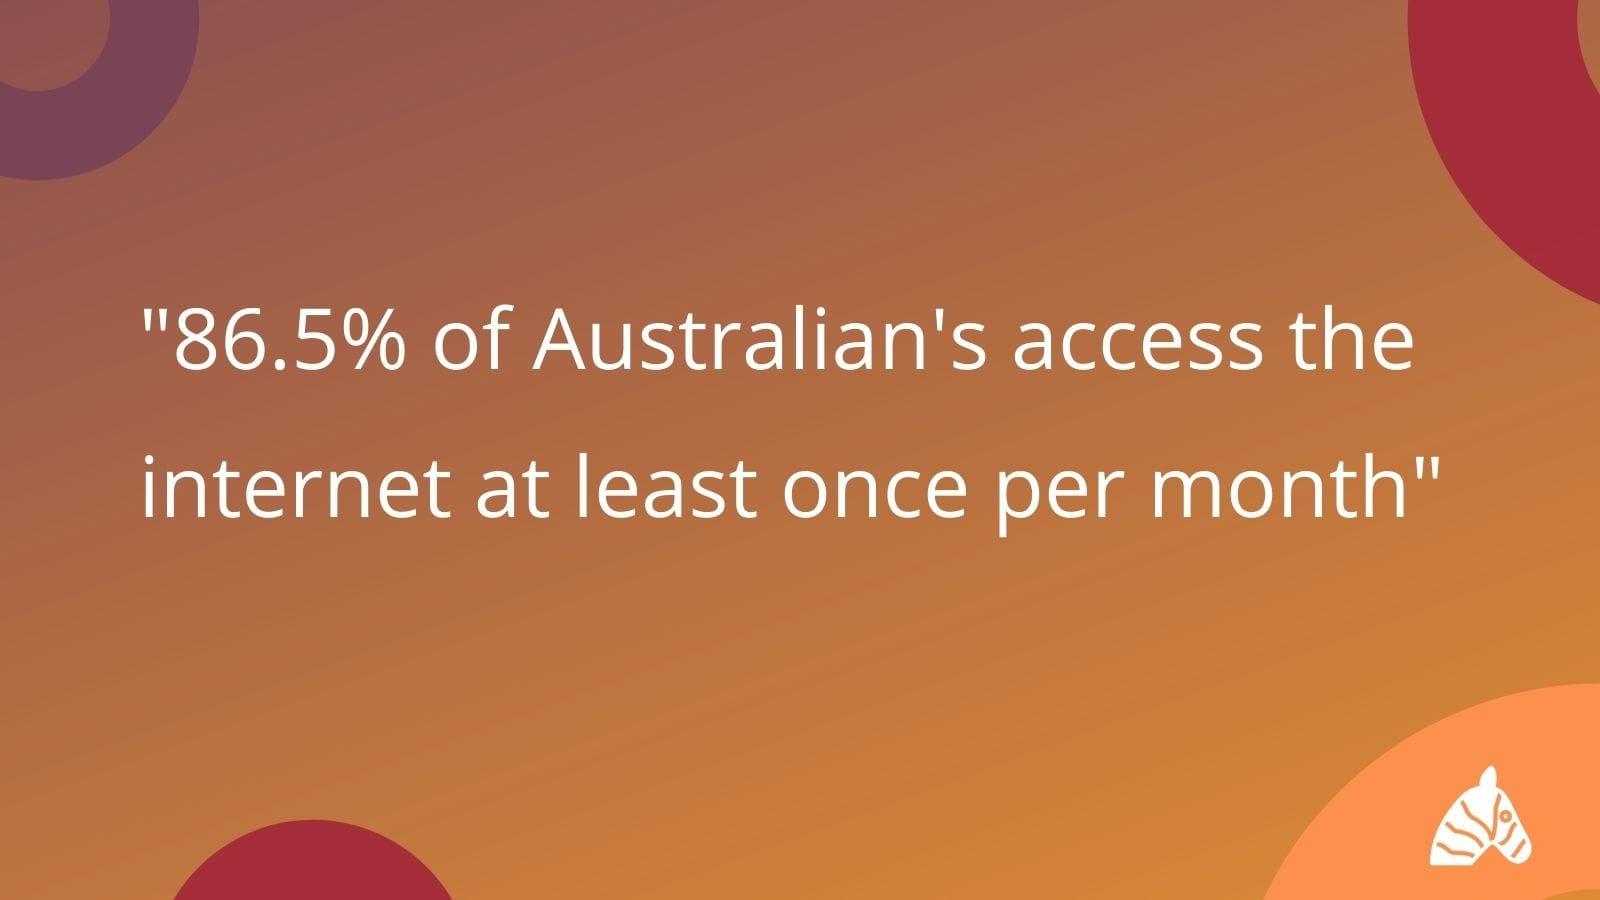 australian internet access statistics